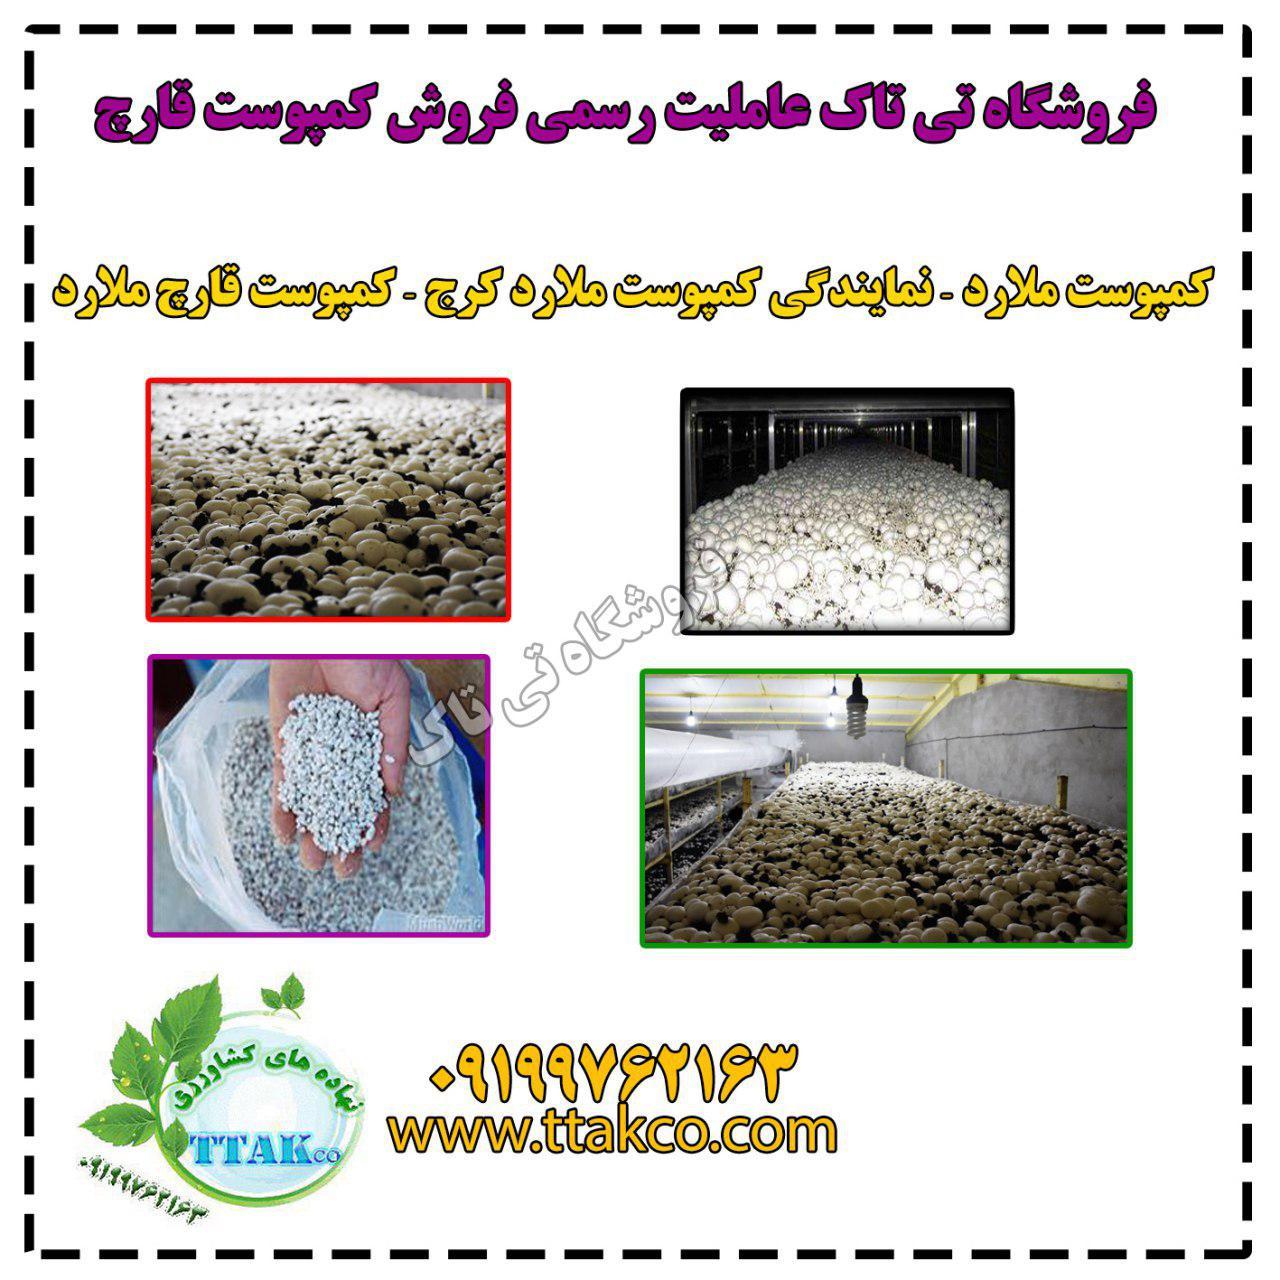 فروش کمپوست بیتا<br/><br/>09120578916 ترکمان<br/><br/>تجهیزات پرورش قارچ<br/>کمپوست قارچ دکمه ای - بذر قارچ دکمه ای <br/><br/>ارائه بذر قارچ صدفی و دکمه ای و خاک پوششی قارچ دکمه  industry agriculture agriculture